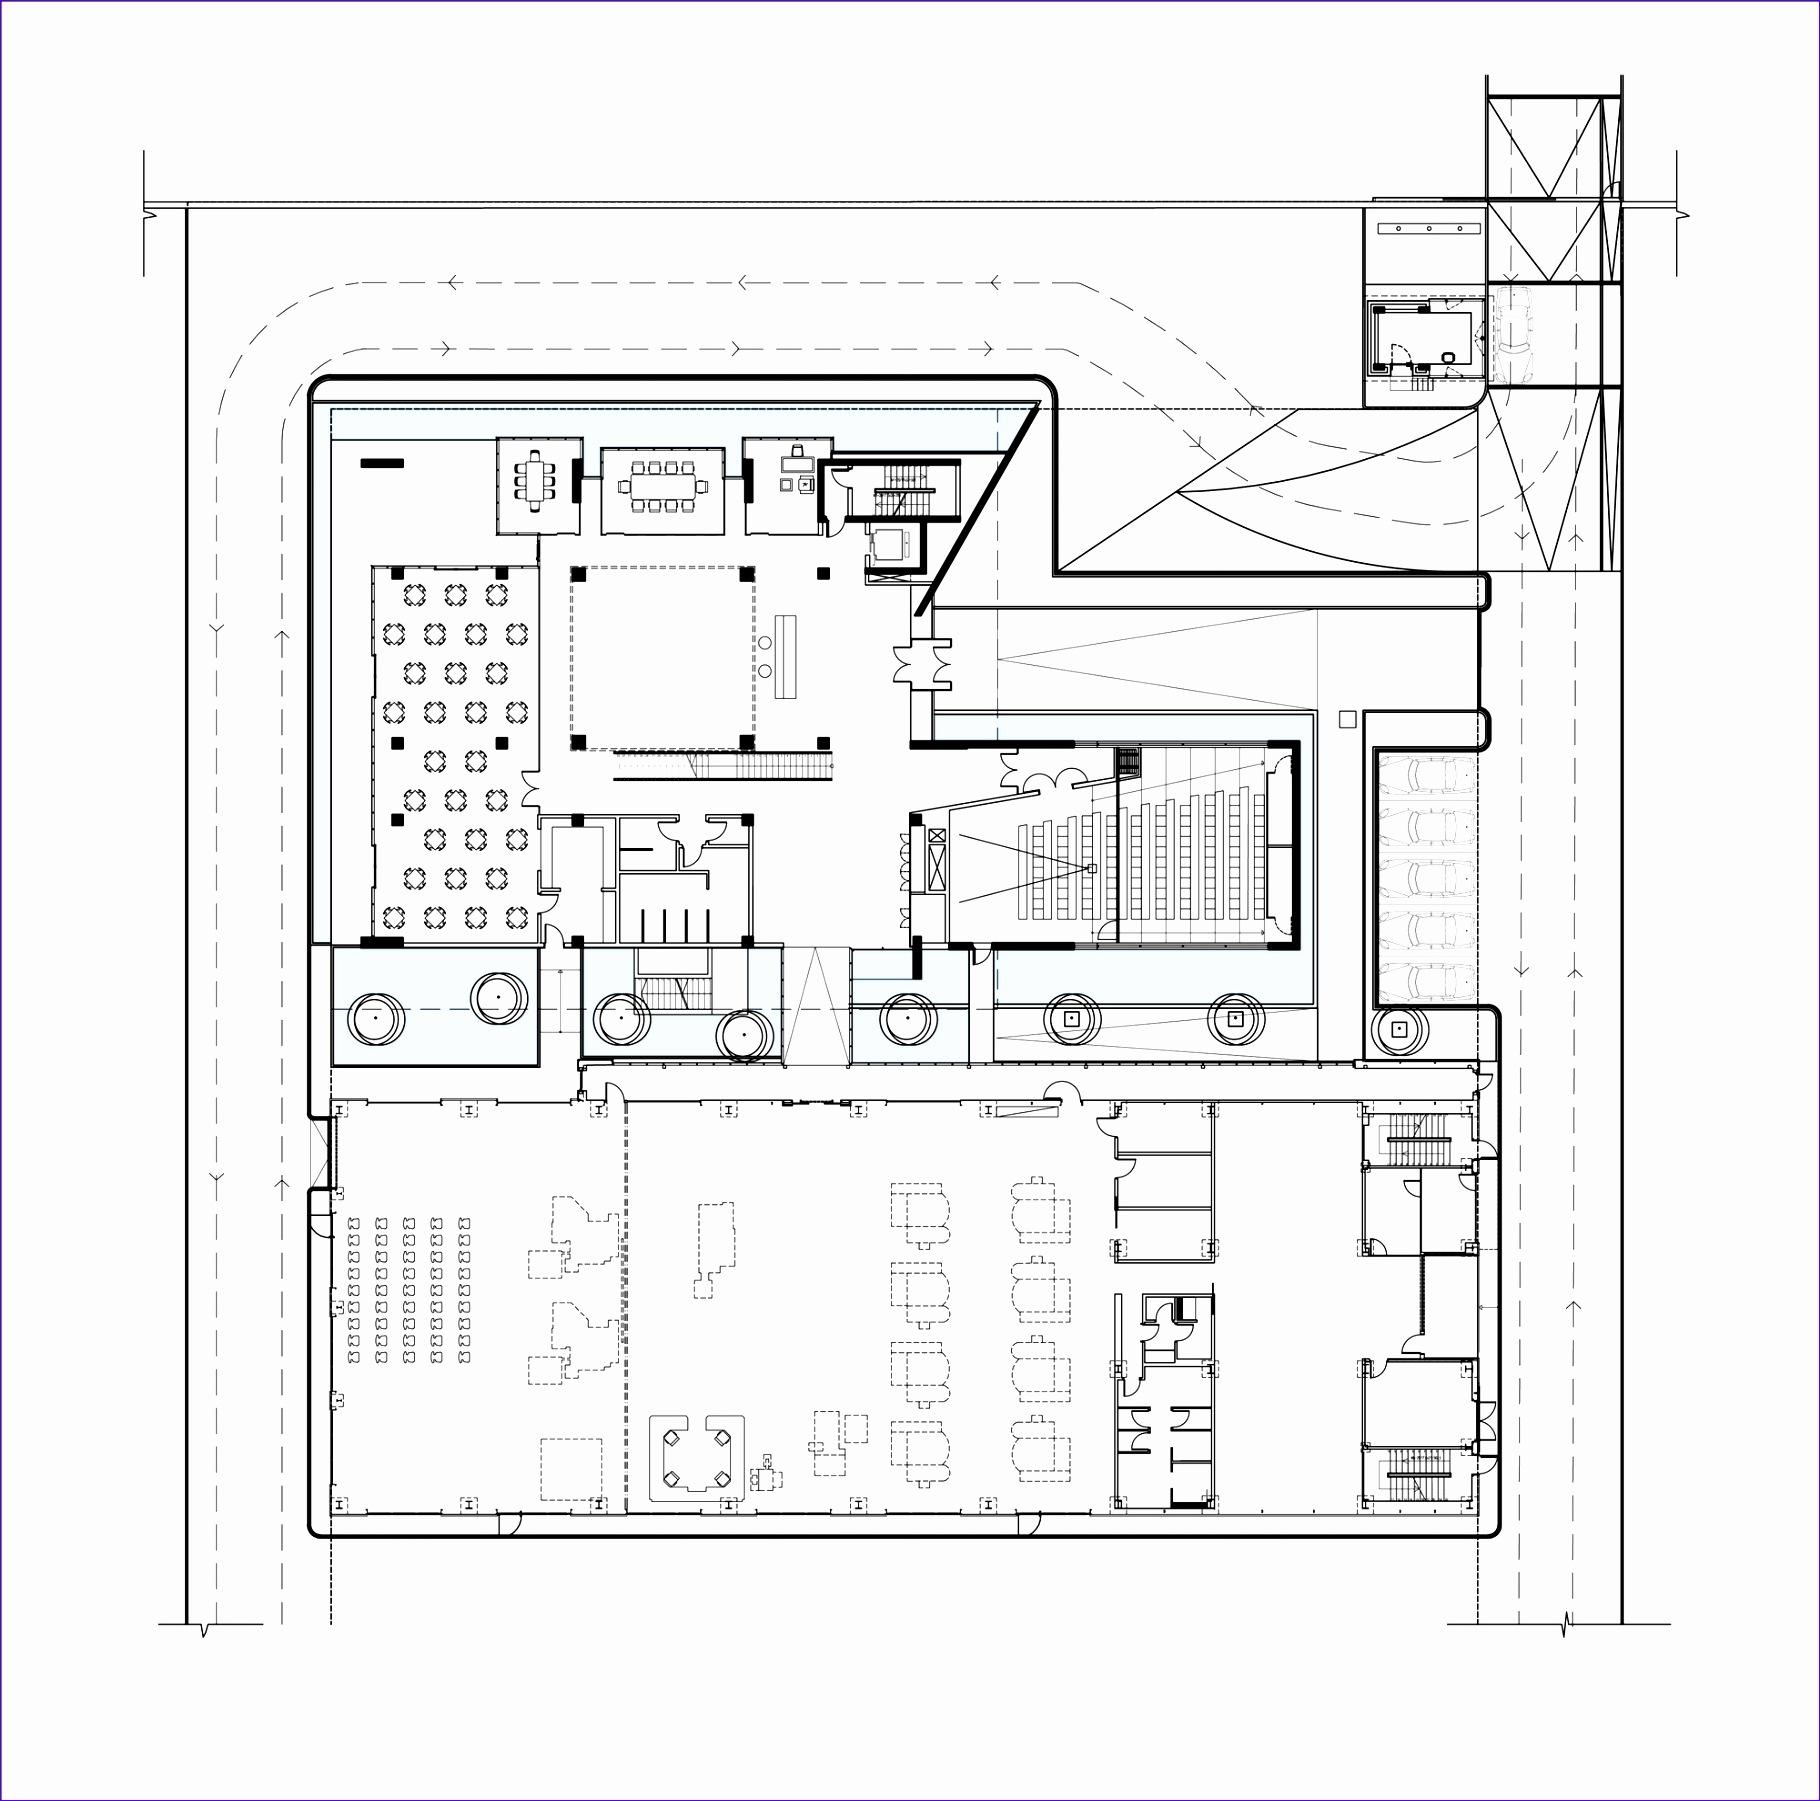 5355ec33c07a80f16a taegutec gokhan aktan altug floor plan 18201801